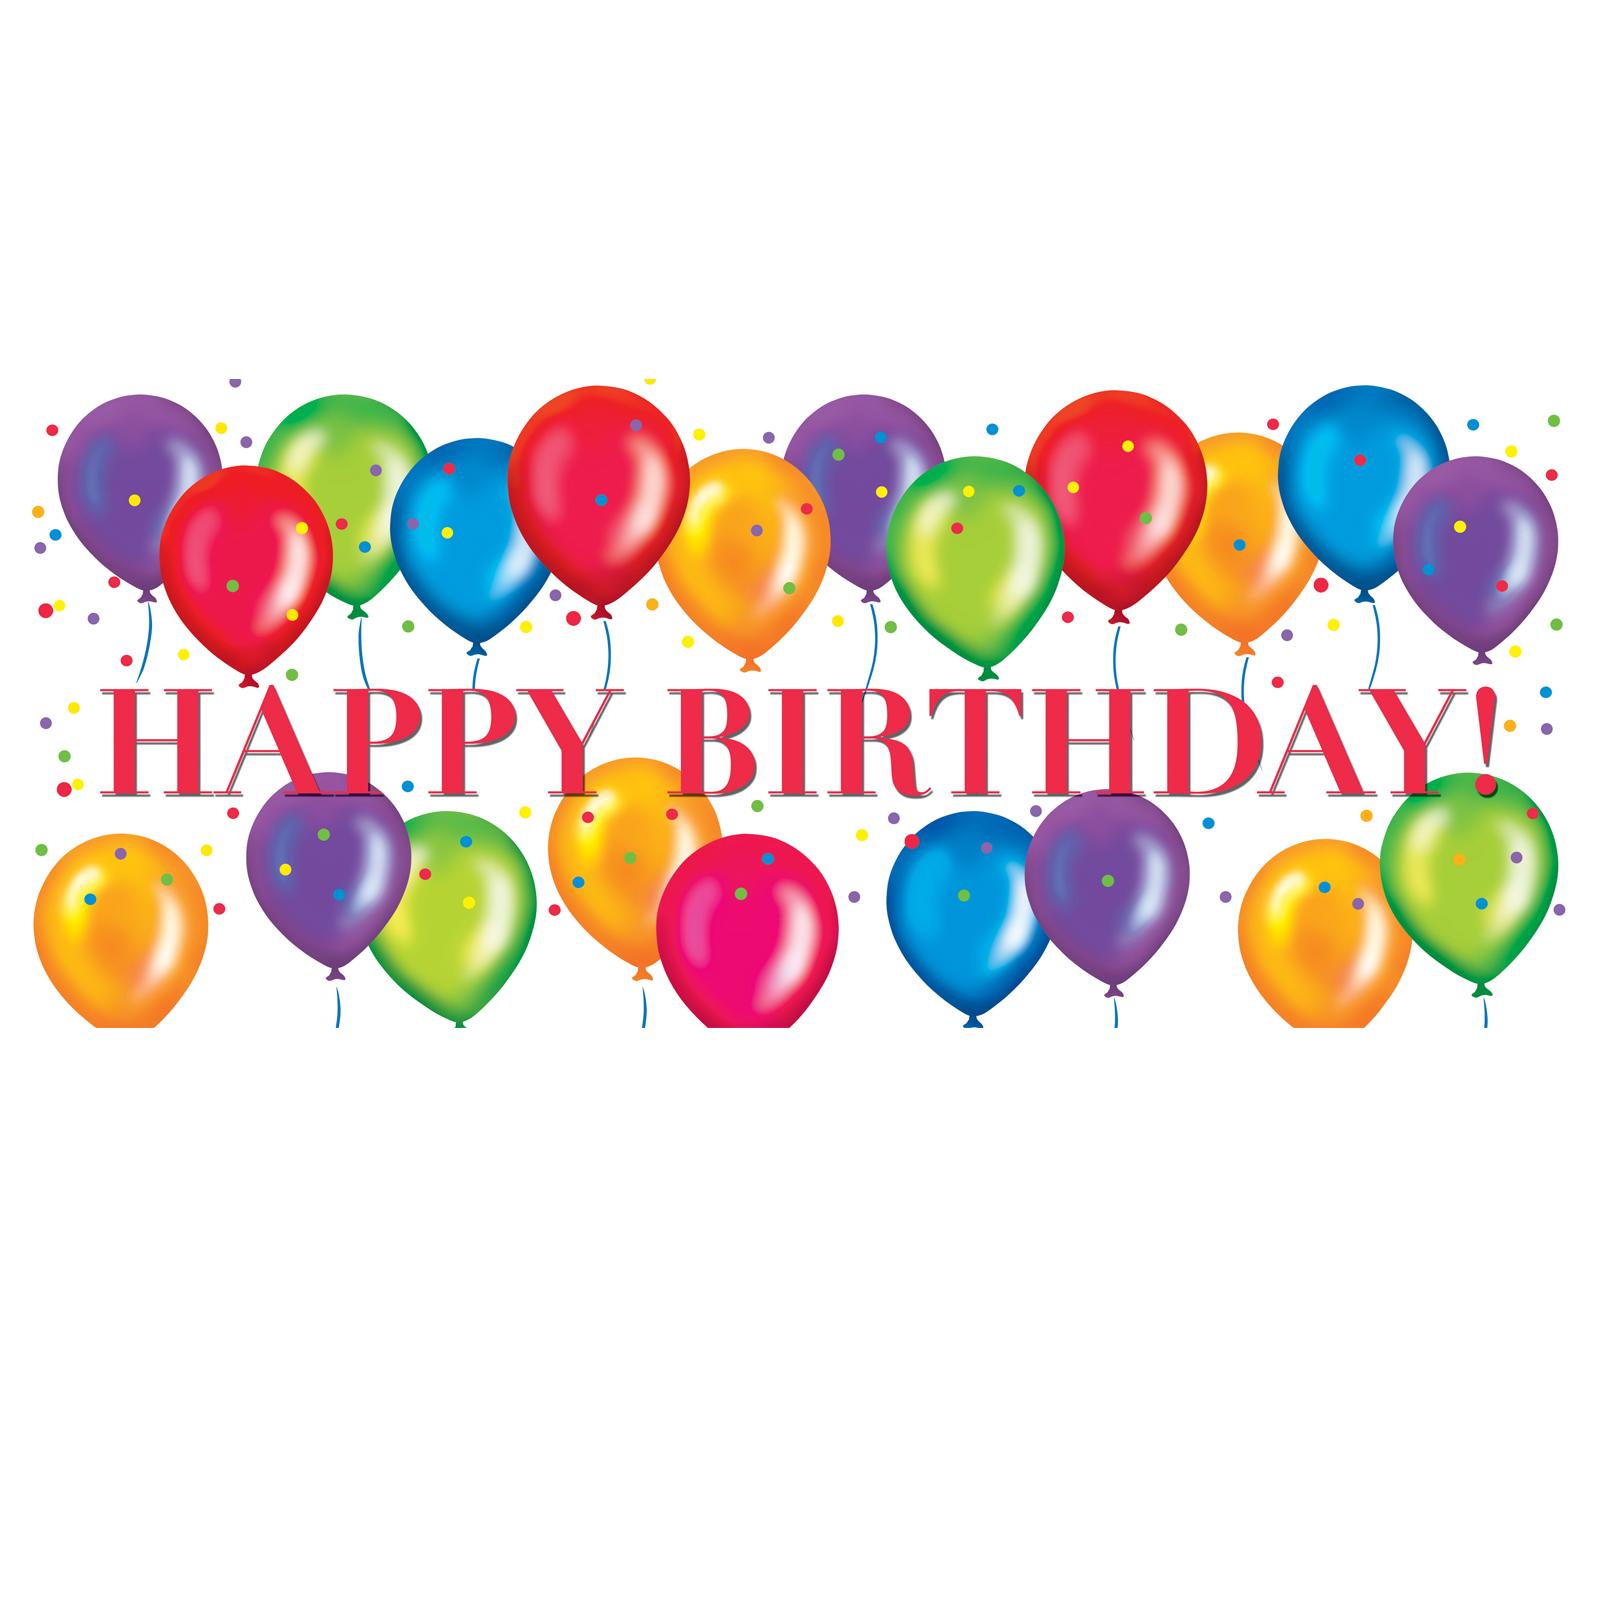 Happy birthday clip art 6 1. free to share disneys 1st .